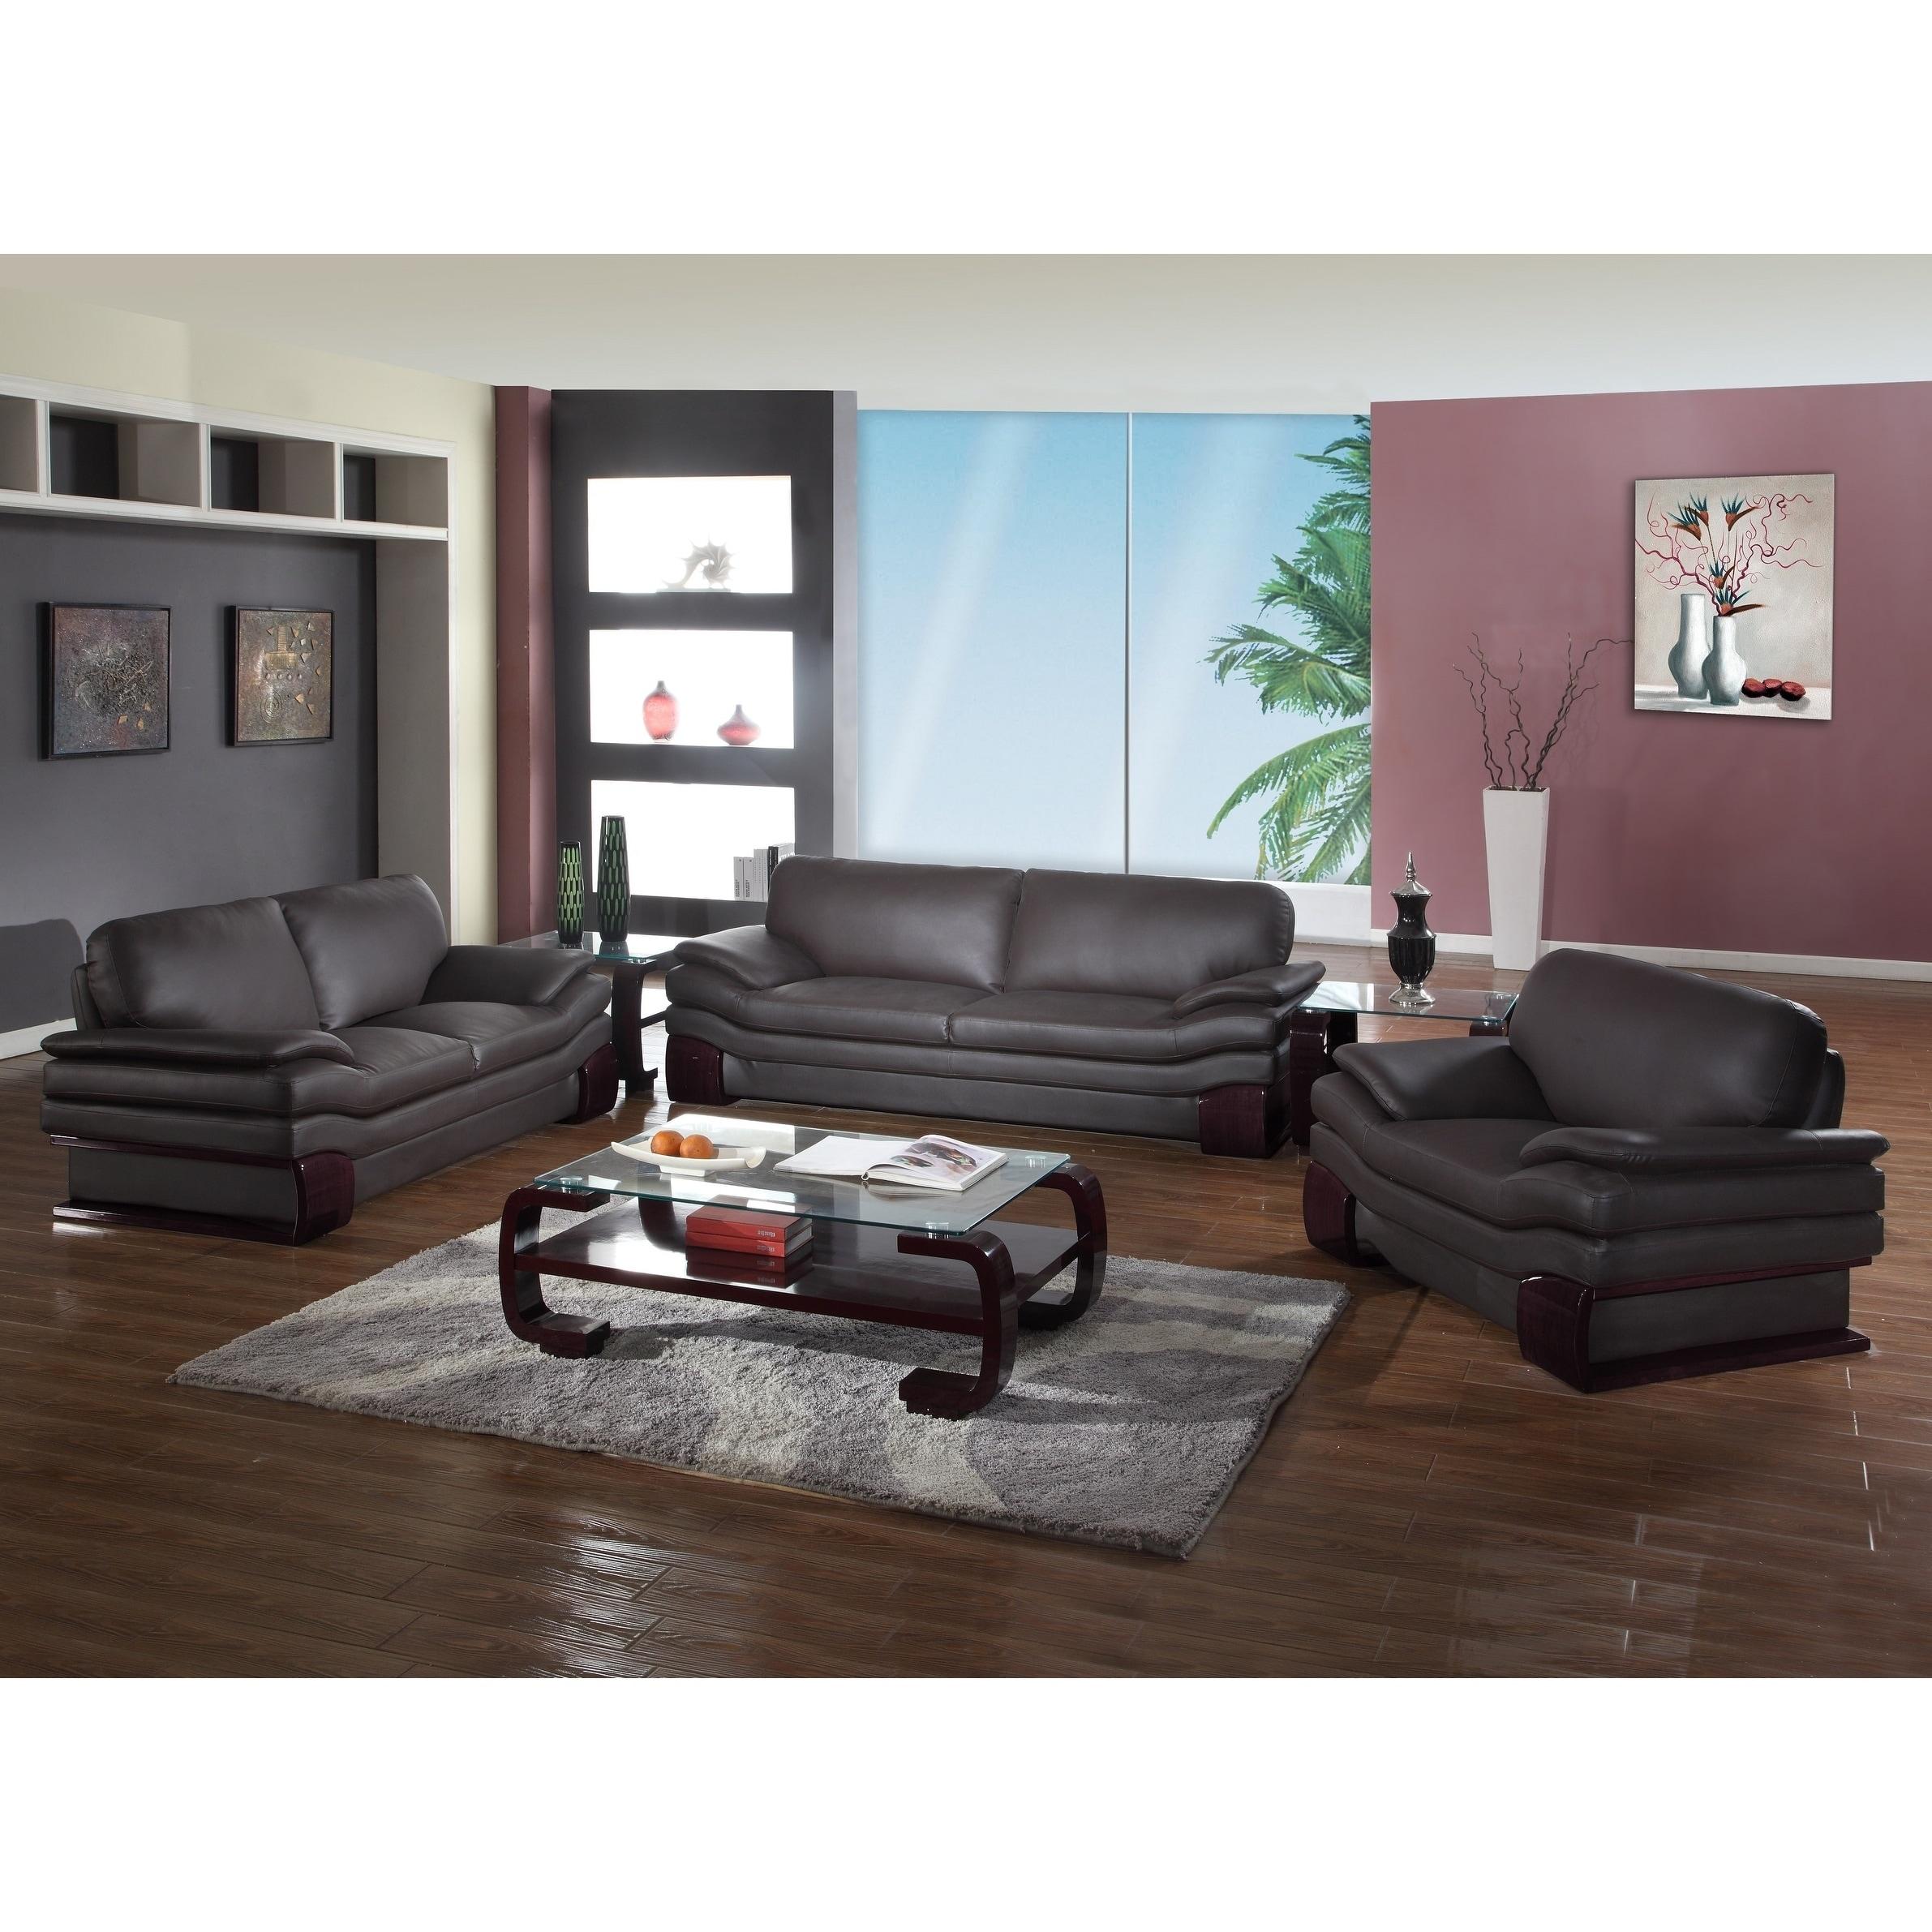 GU Furniture Leather/Match Upholstered 3-Piece Living Room Sofa Set